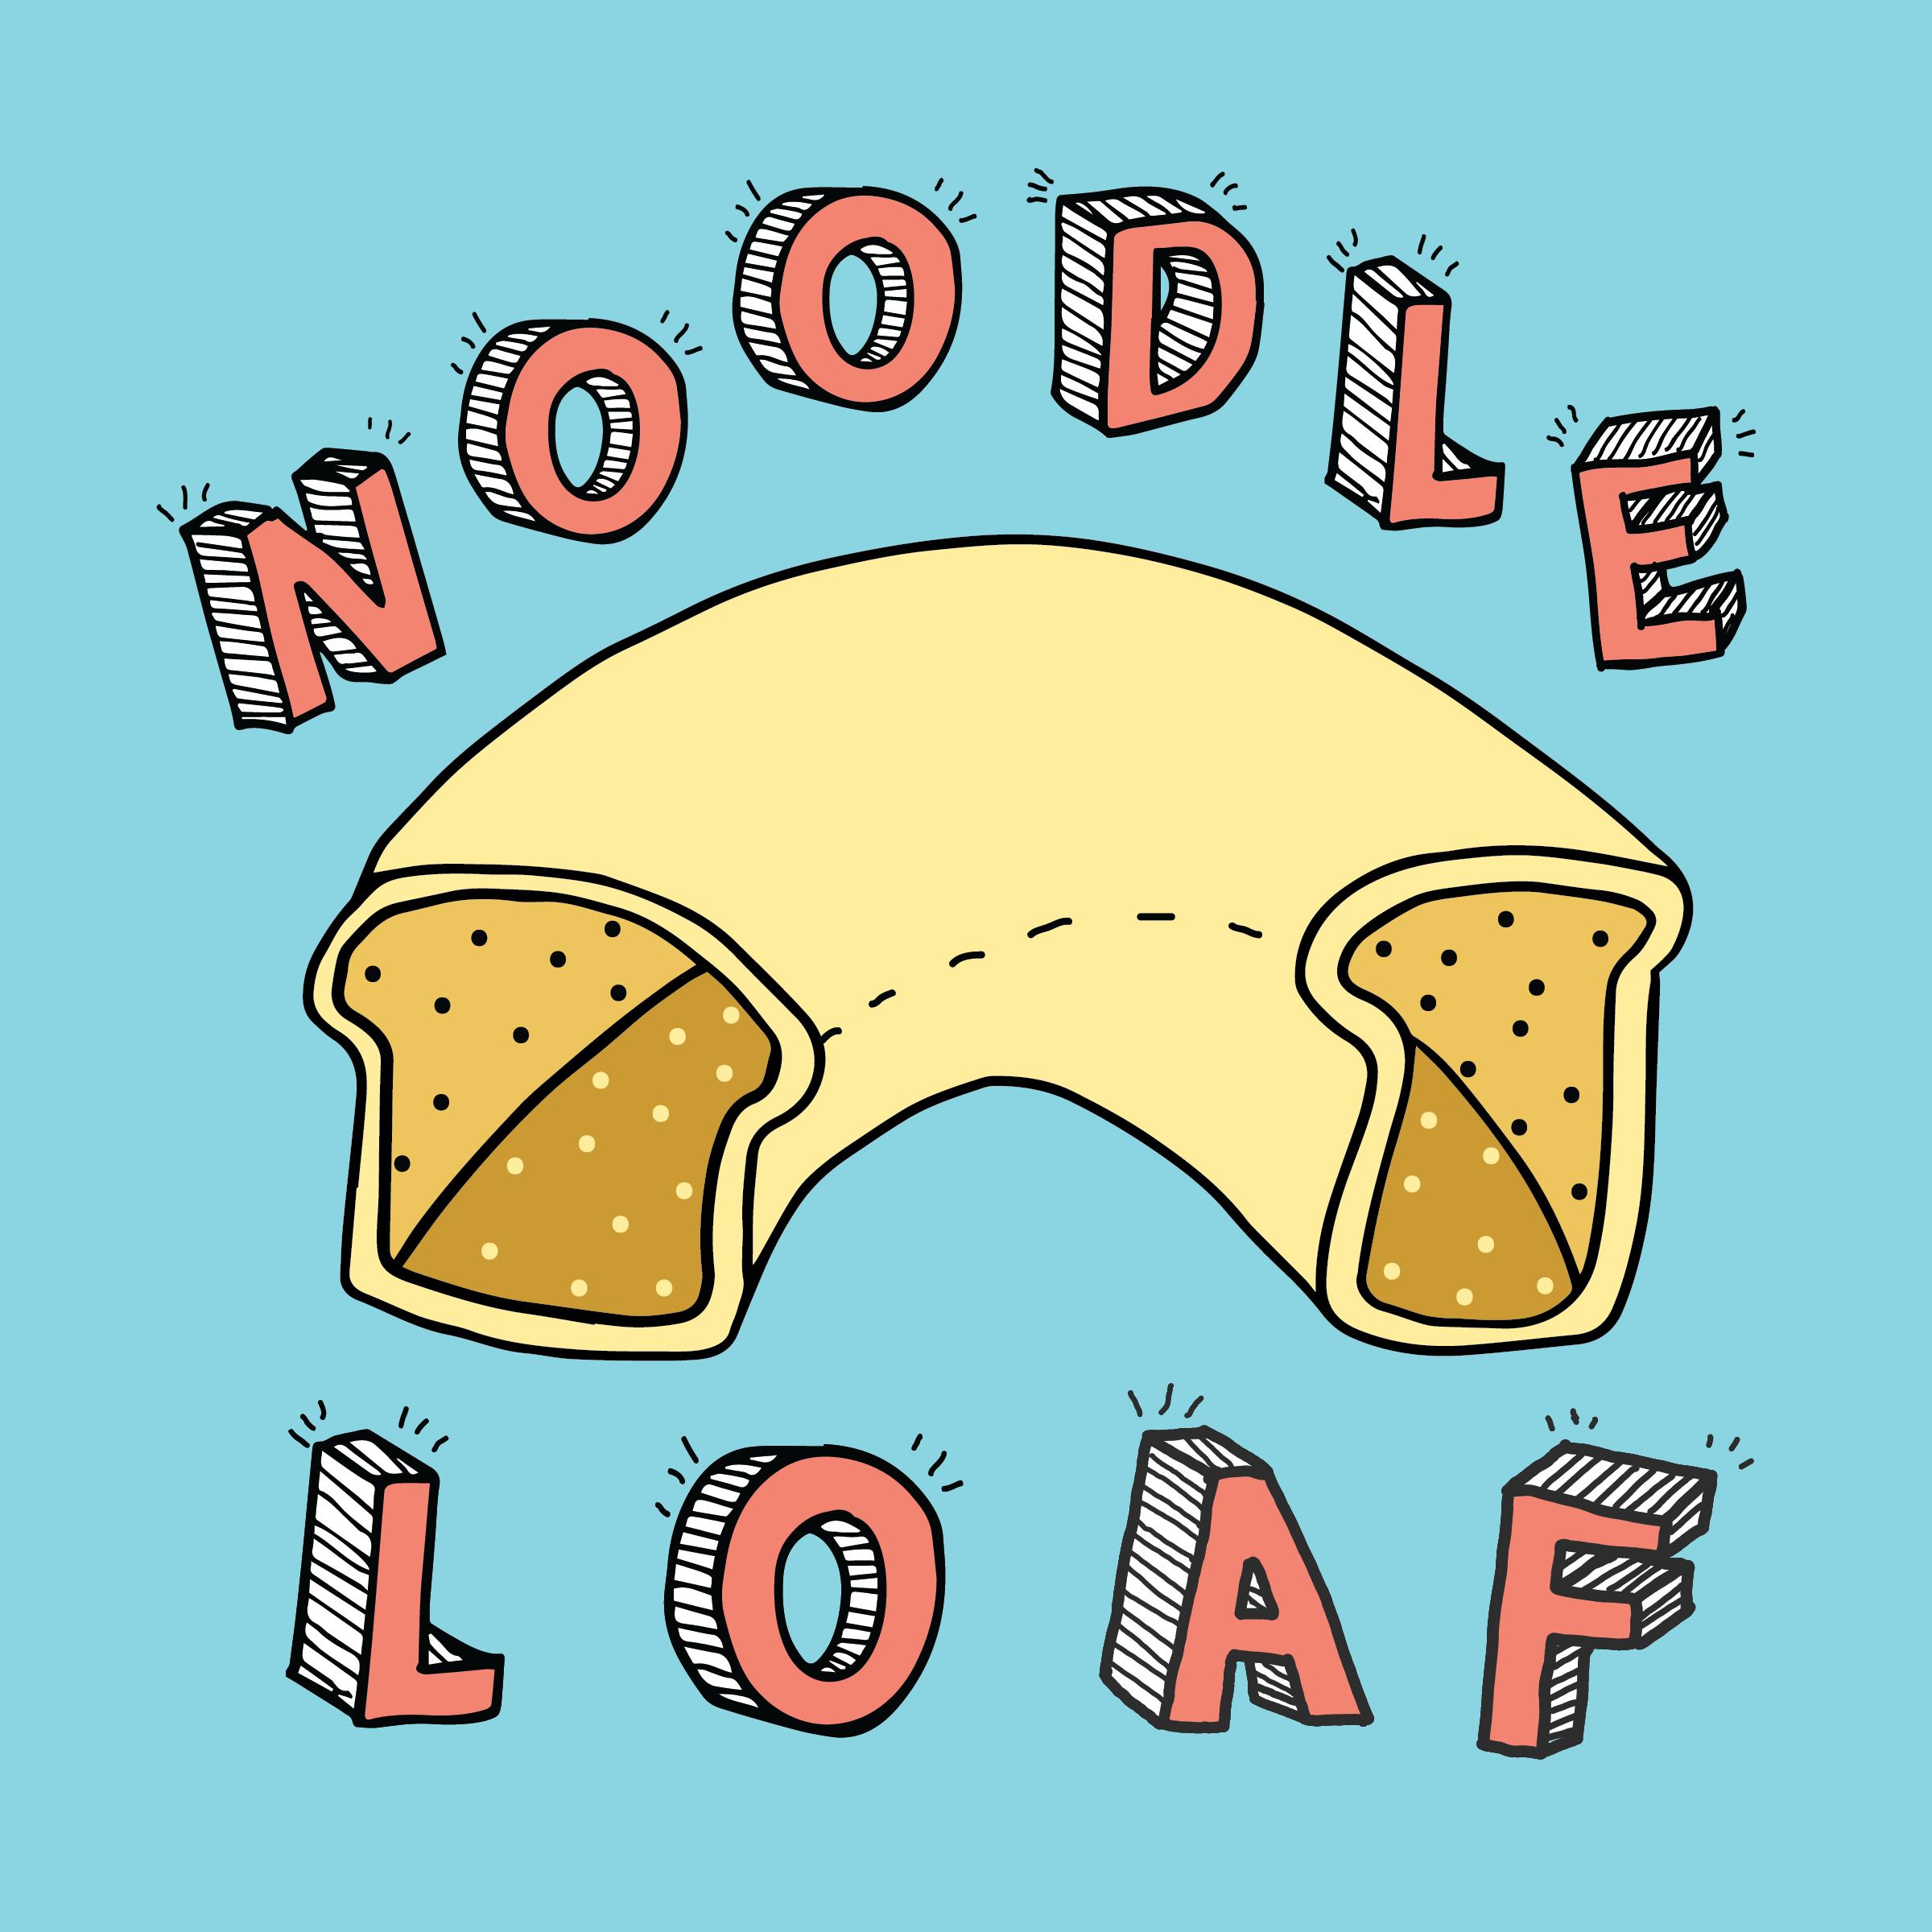 Noodle Loaf - Music Education Podcast for Kids show art